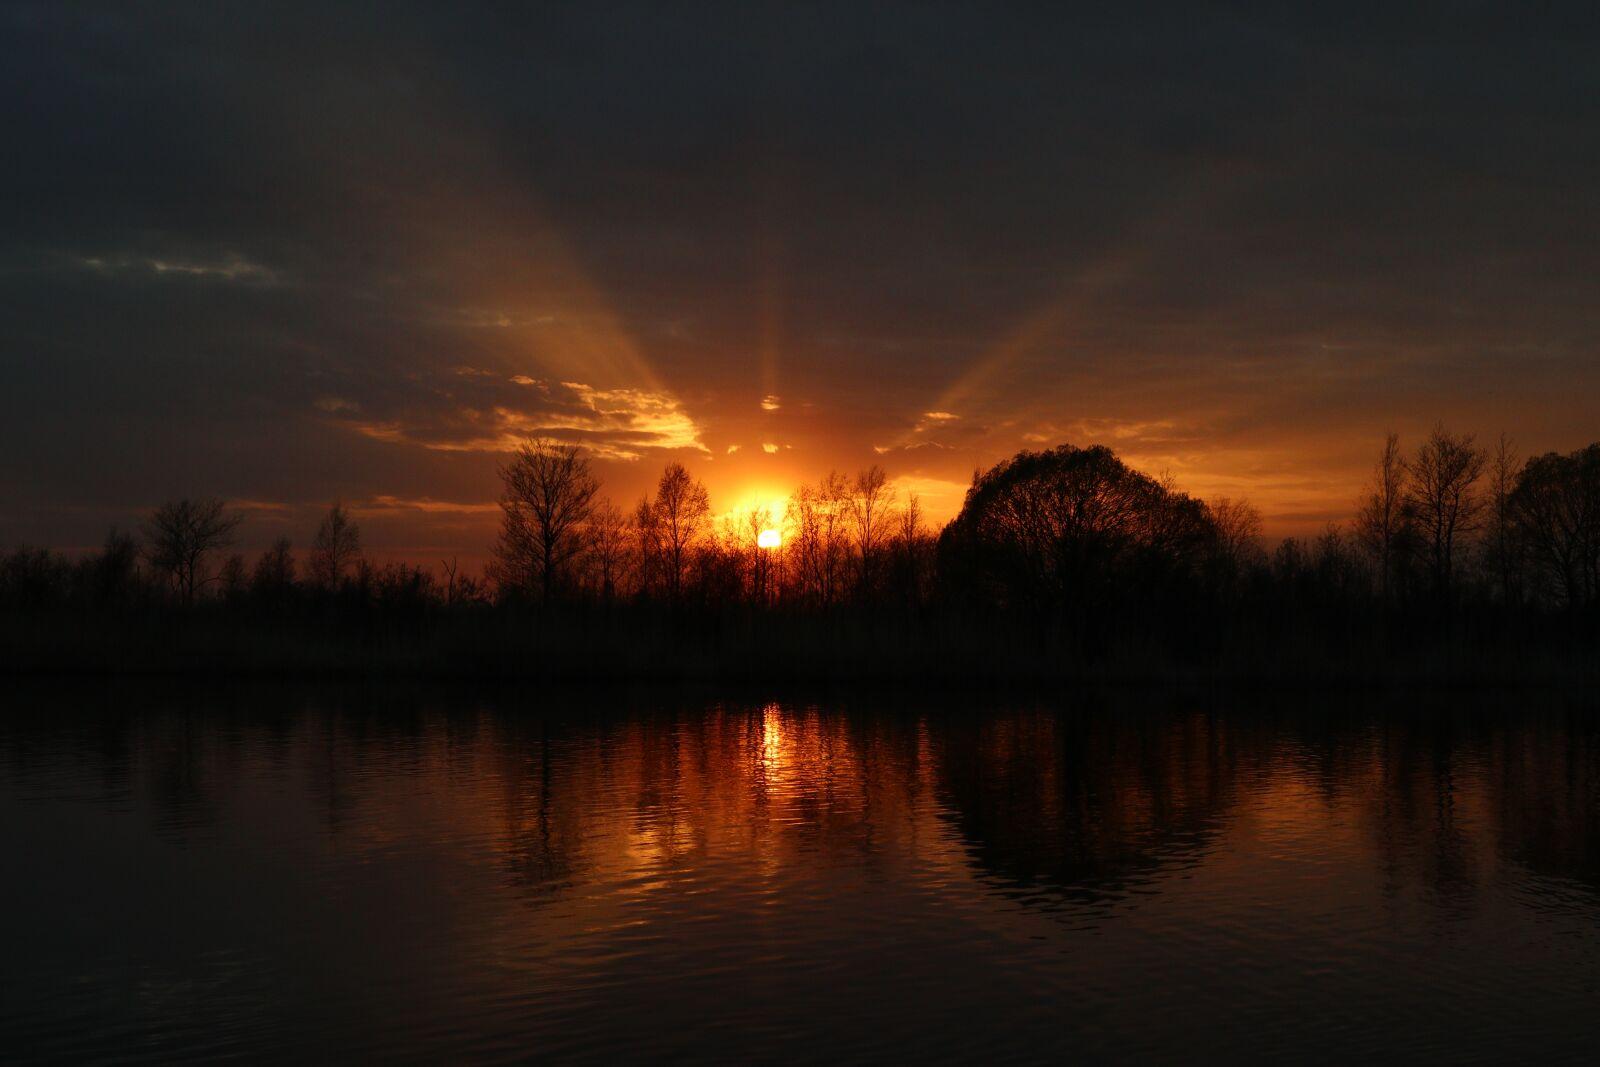 sunset, spring, river